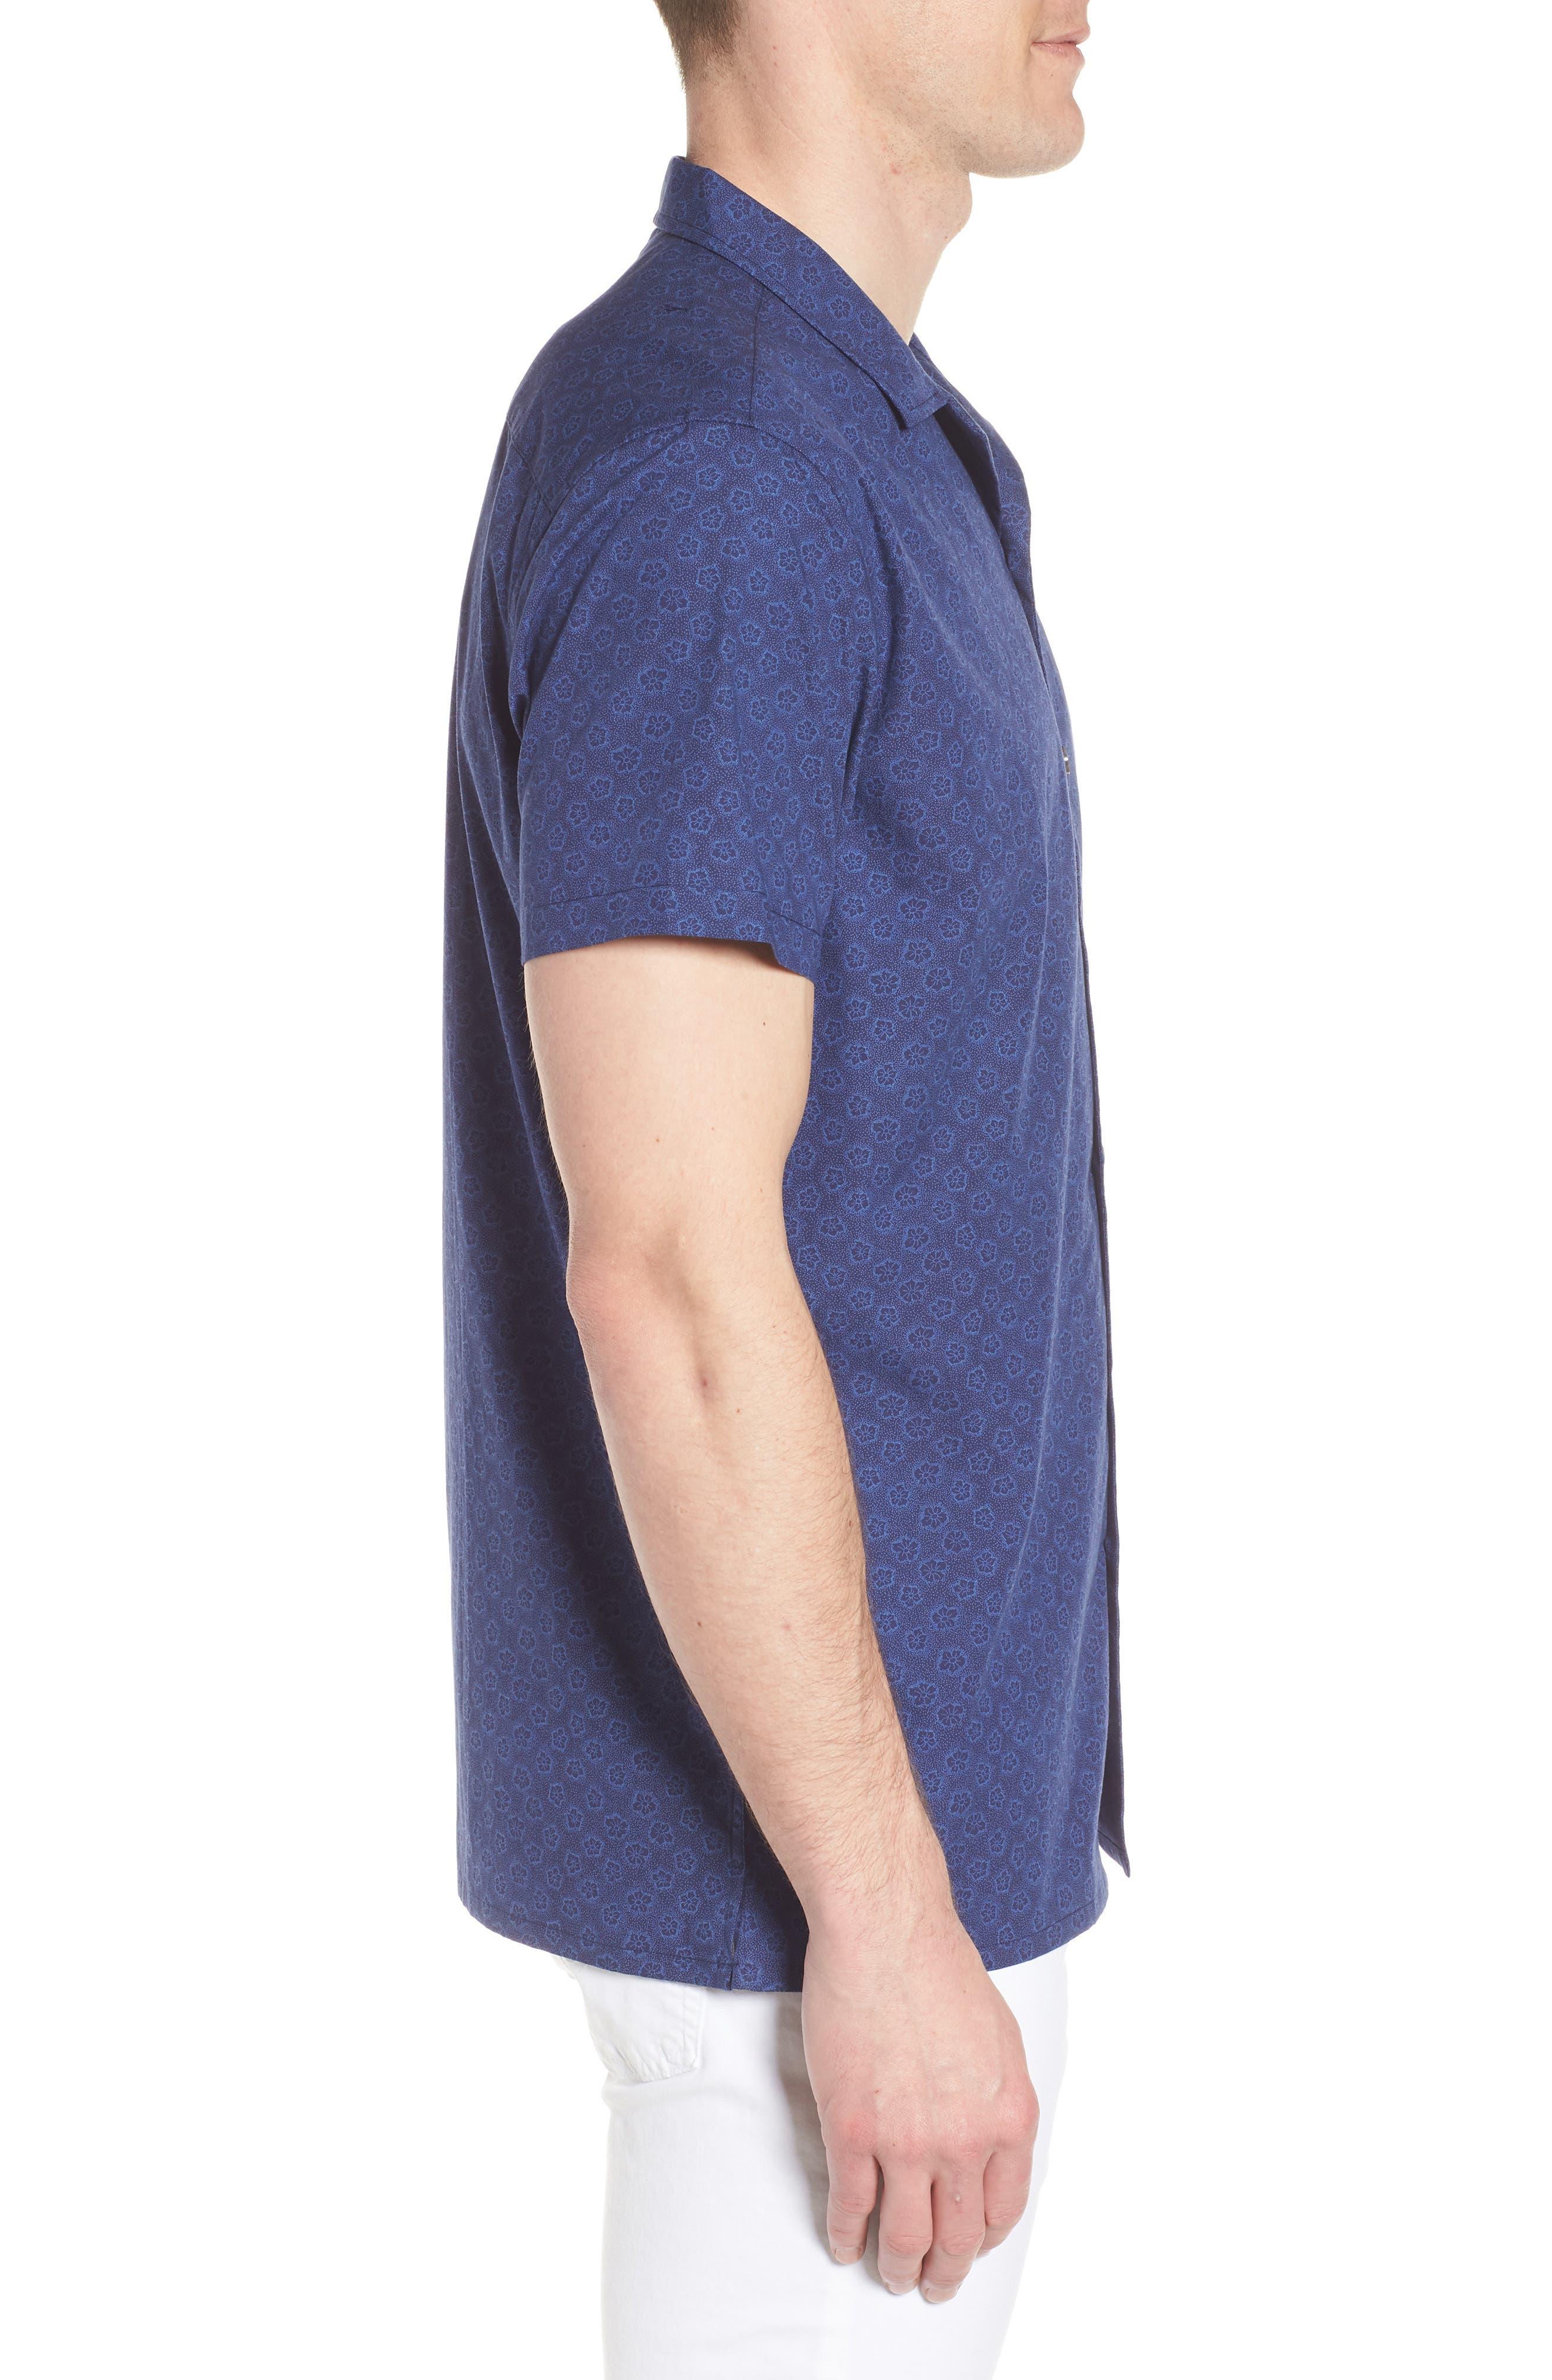 COASTAORO,                             Camp Corones Regular Fit Short Sleeve Sport Shirt,                             Alternate thumbnail 3, color,                             410